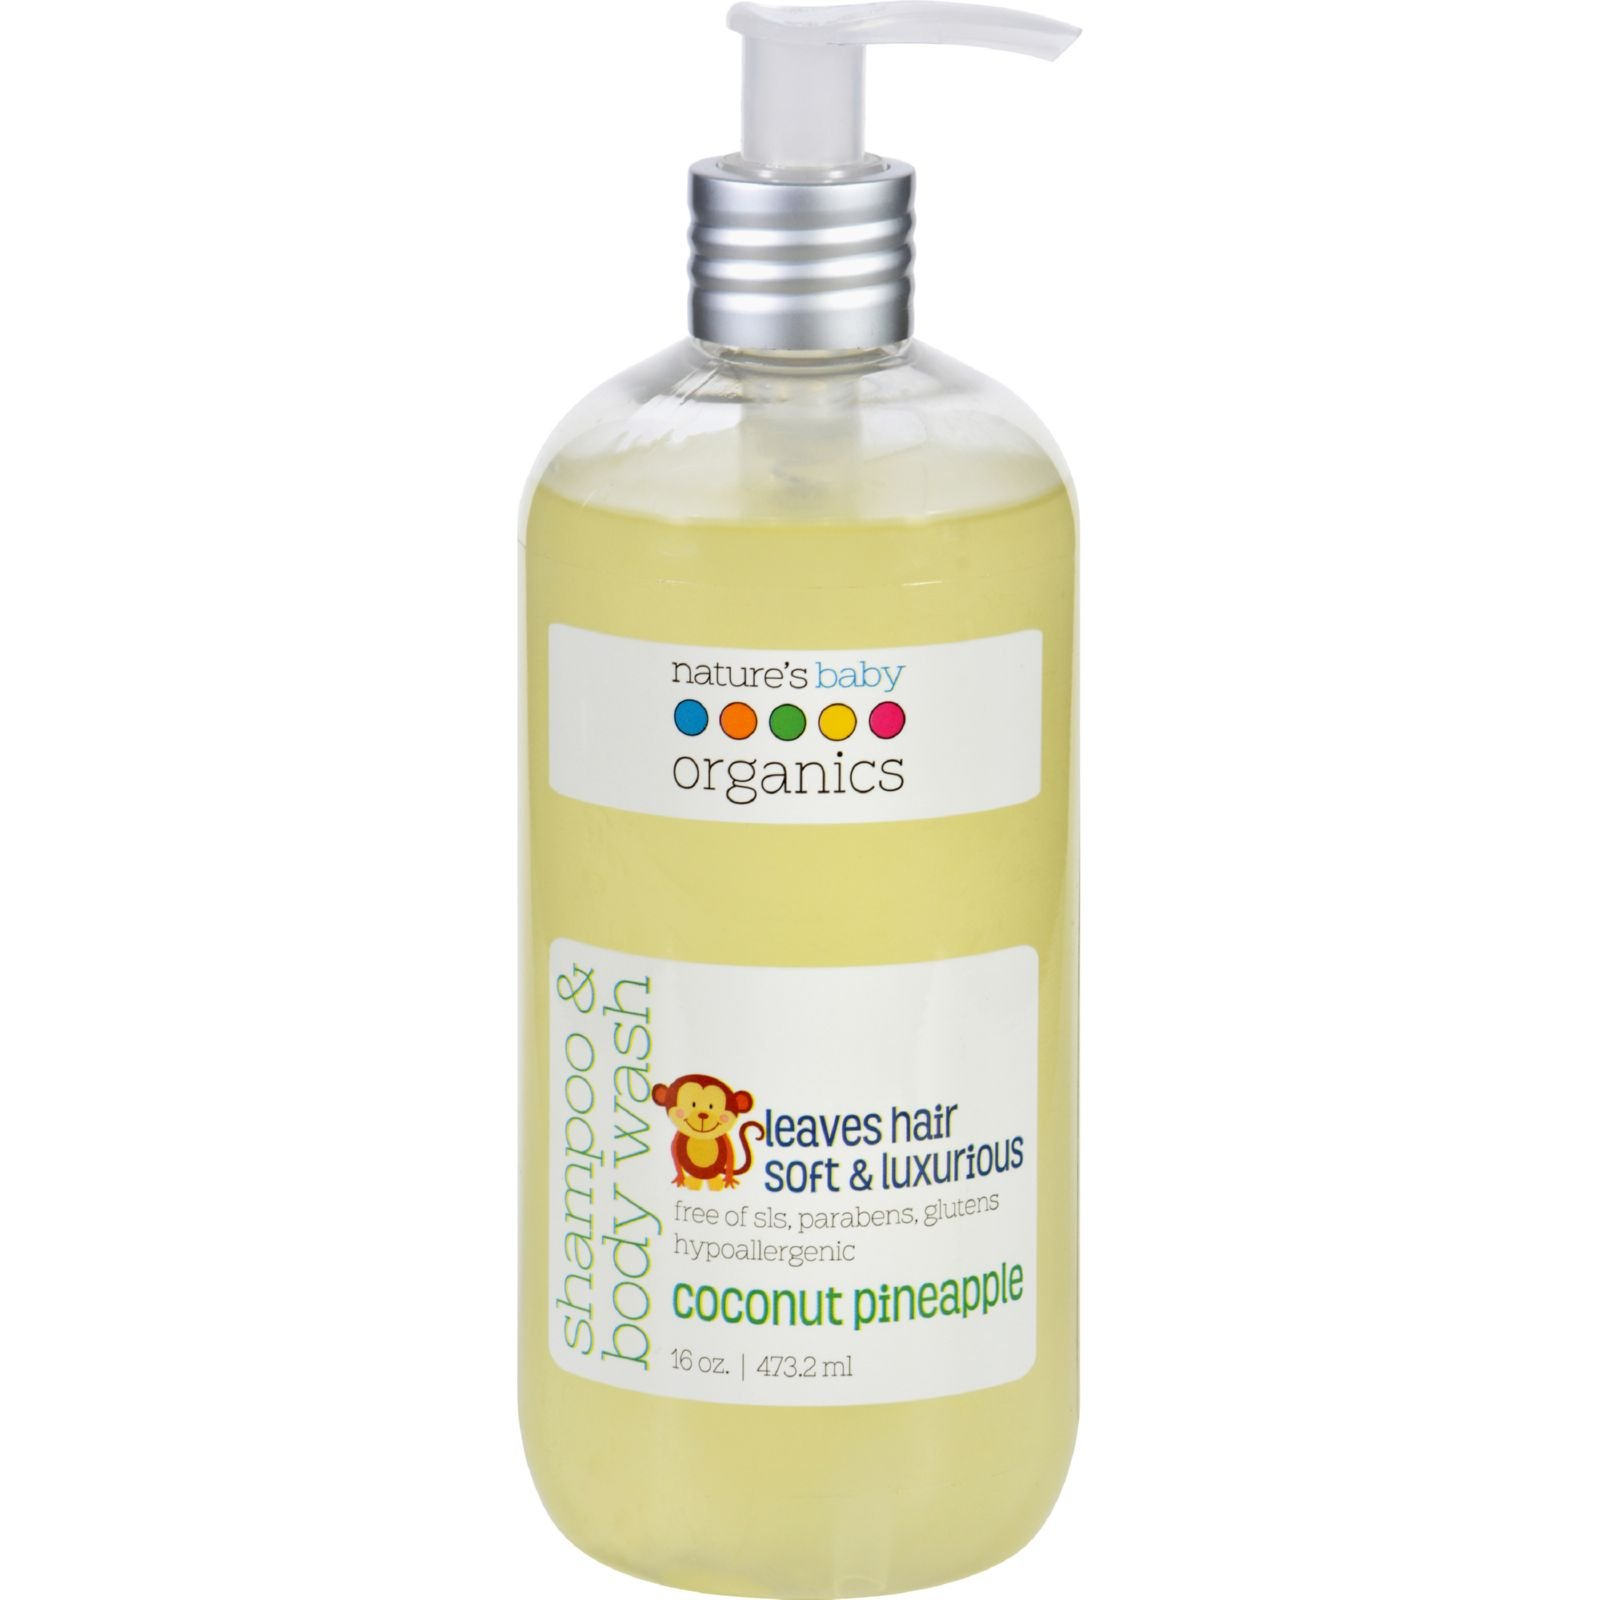 Natures Baby Organics Shampoo and Body Wash - Coconut Pienapple - 16 oz - Gluten Free -